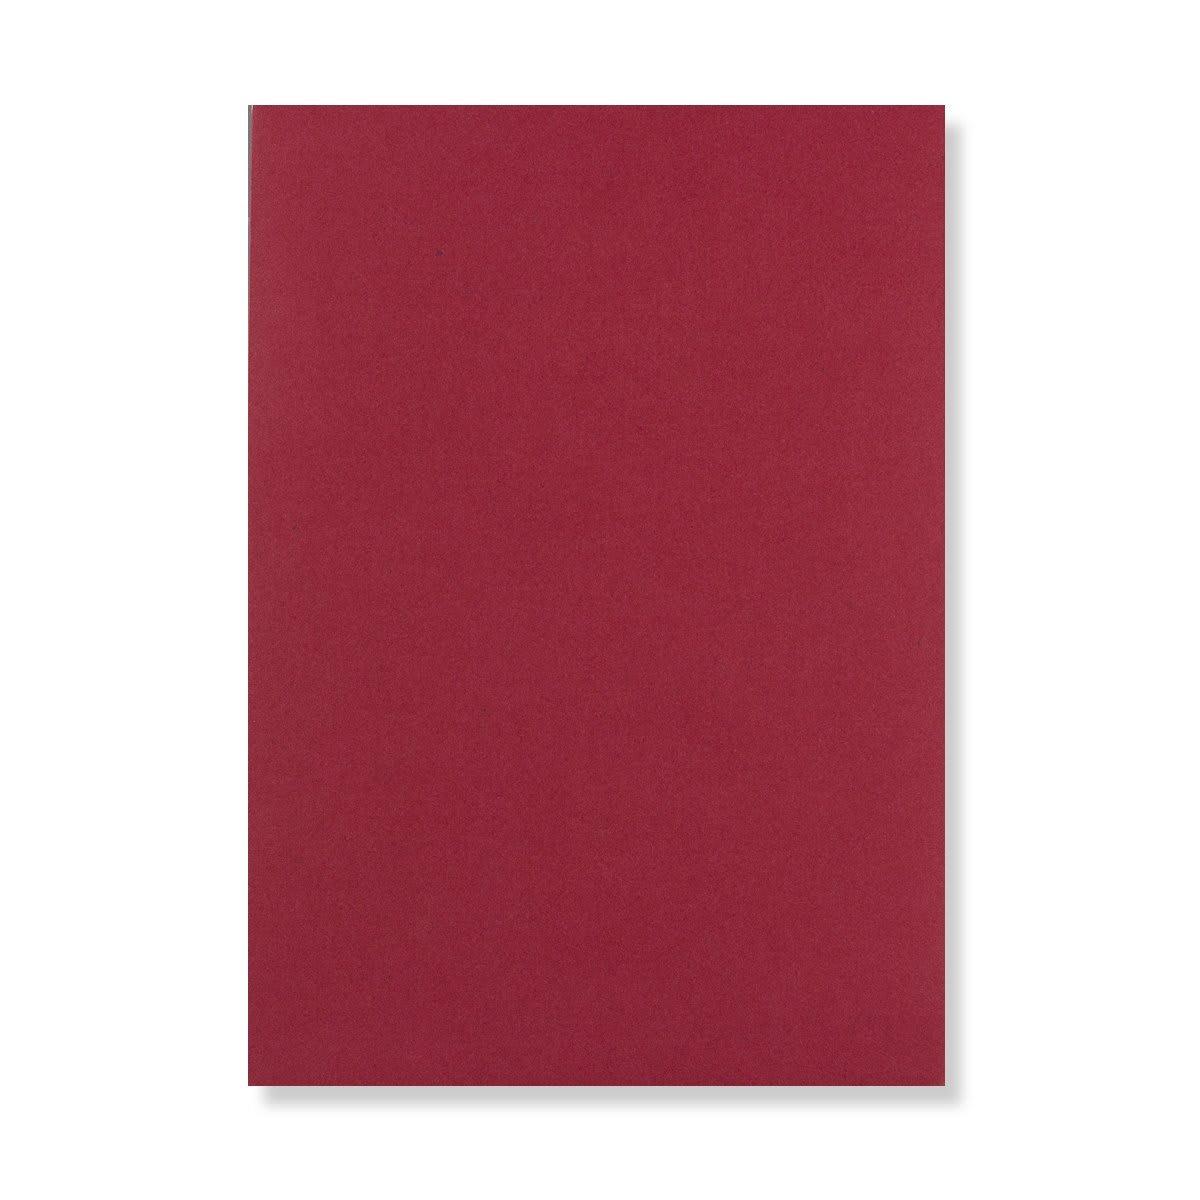 C5 RED STRING & WASHER ENVELOPES 180GSM